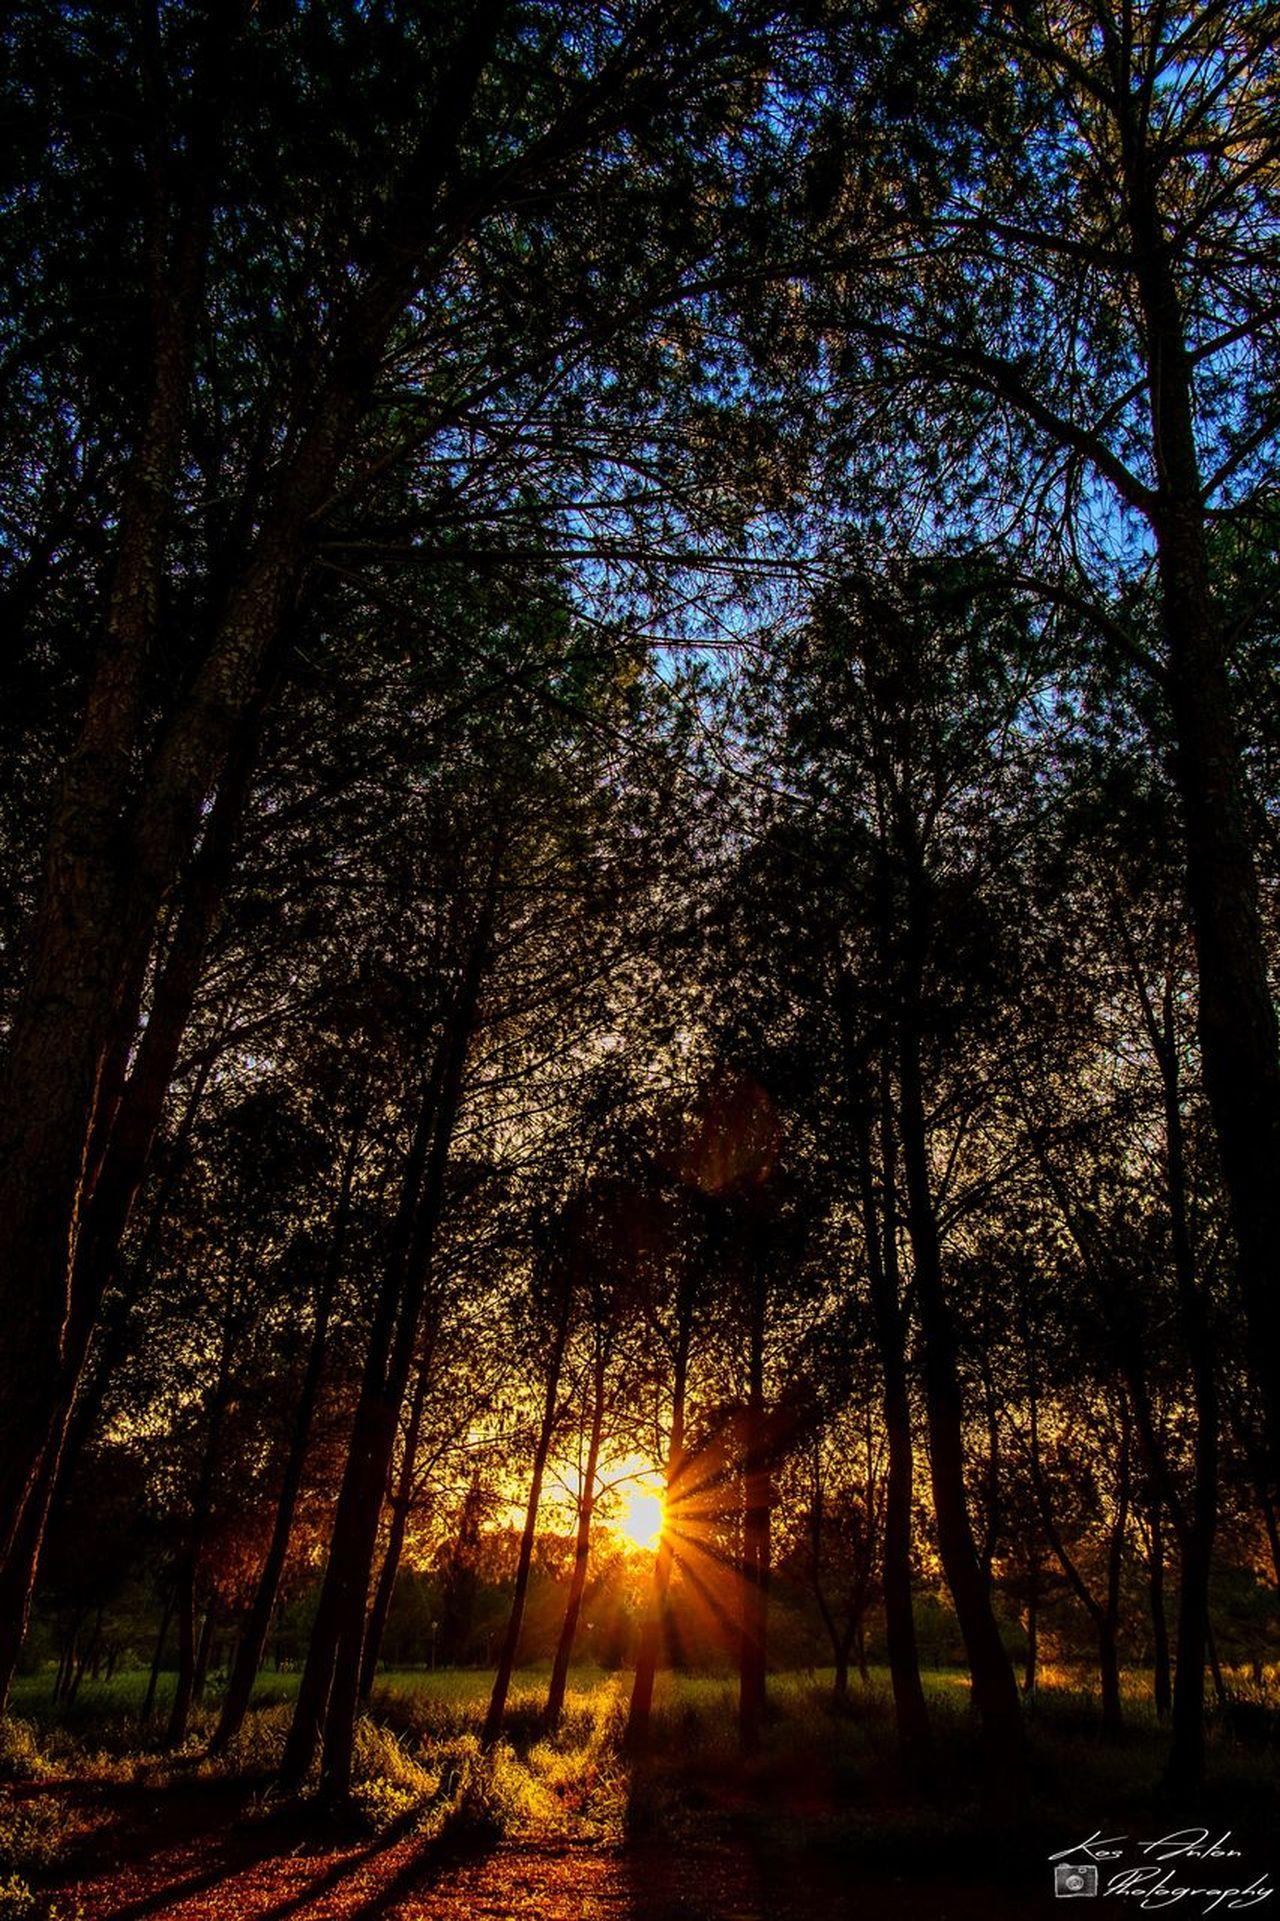 EyeEm Best Shots EyeEm Nature Lover Landscape Nature Nature_collection Sun Sunset Tree Trees